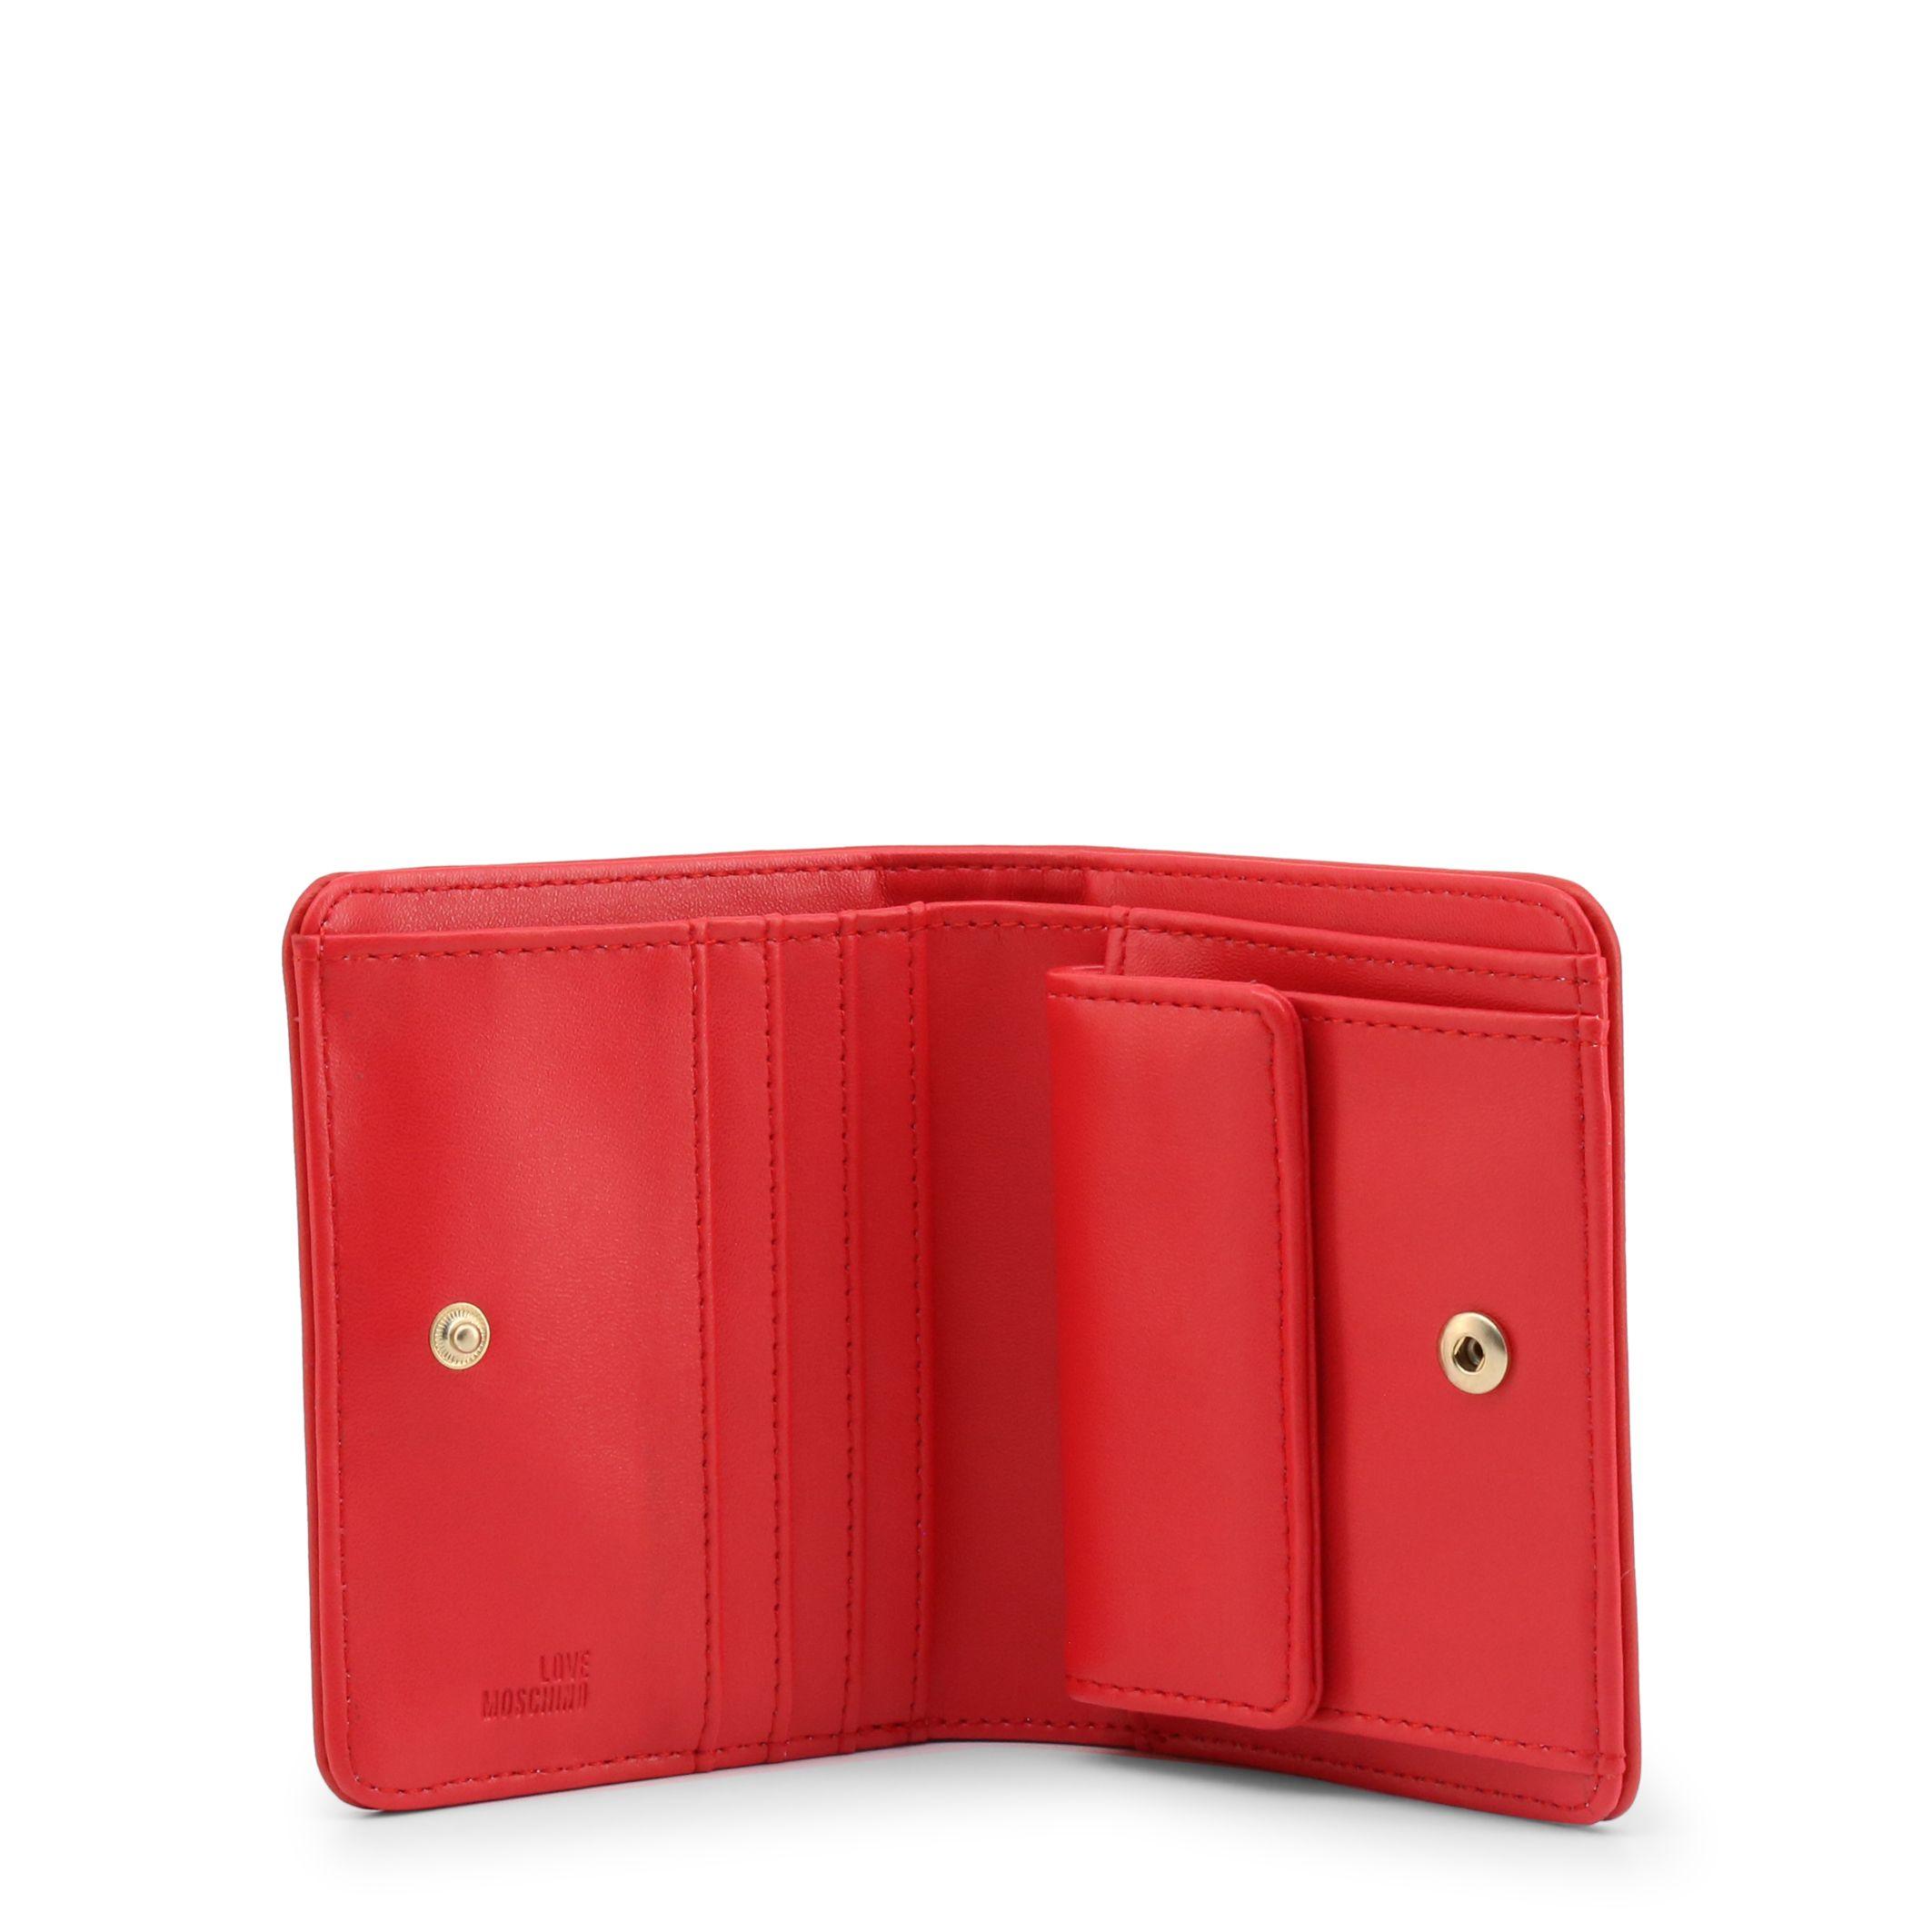 D97Dfc70 8B27 11Eb Abbe 756064413543 Love Moschino - Jc5625Pp1Clf0 - Red